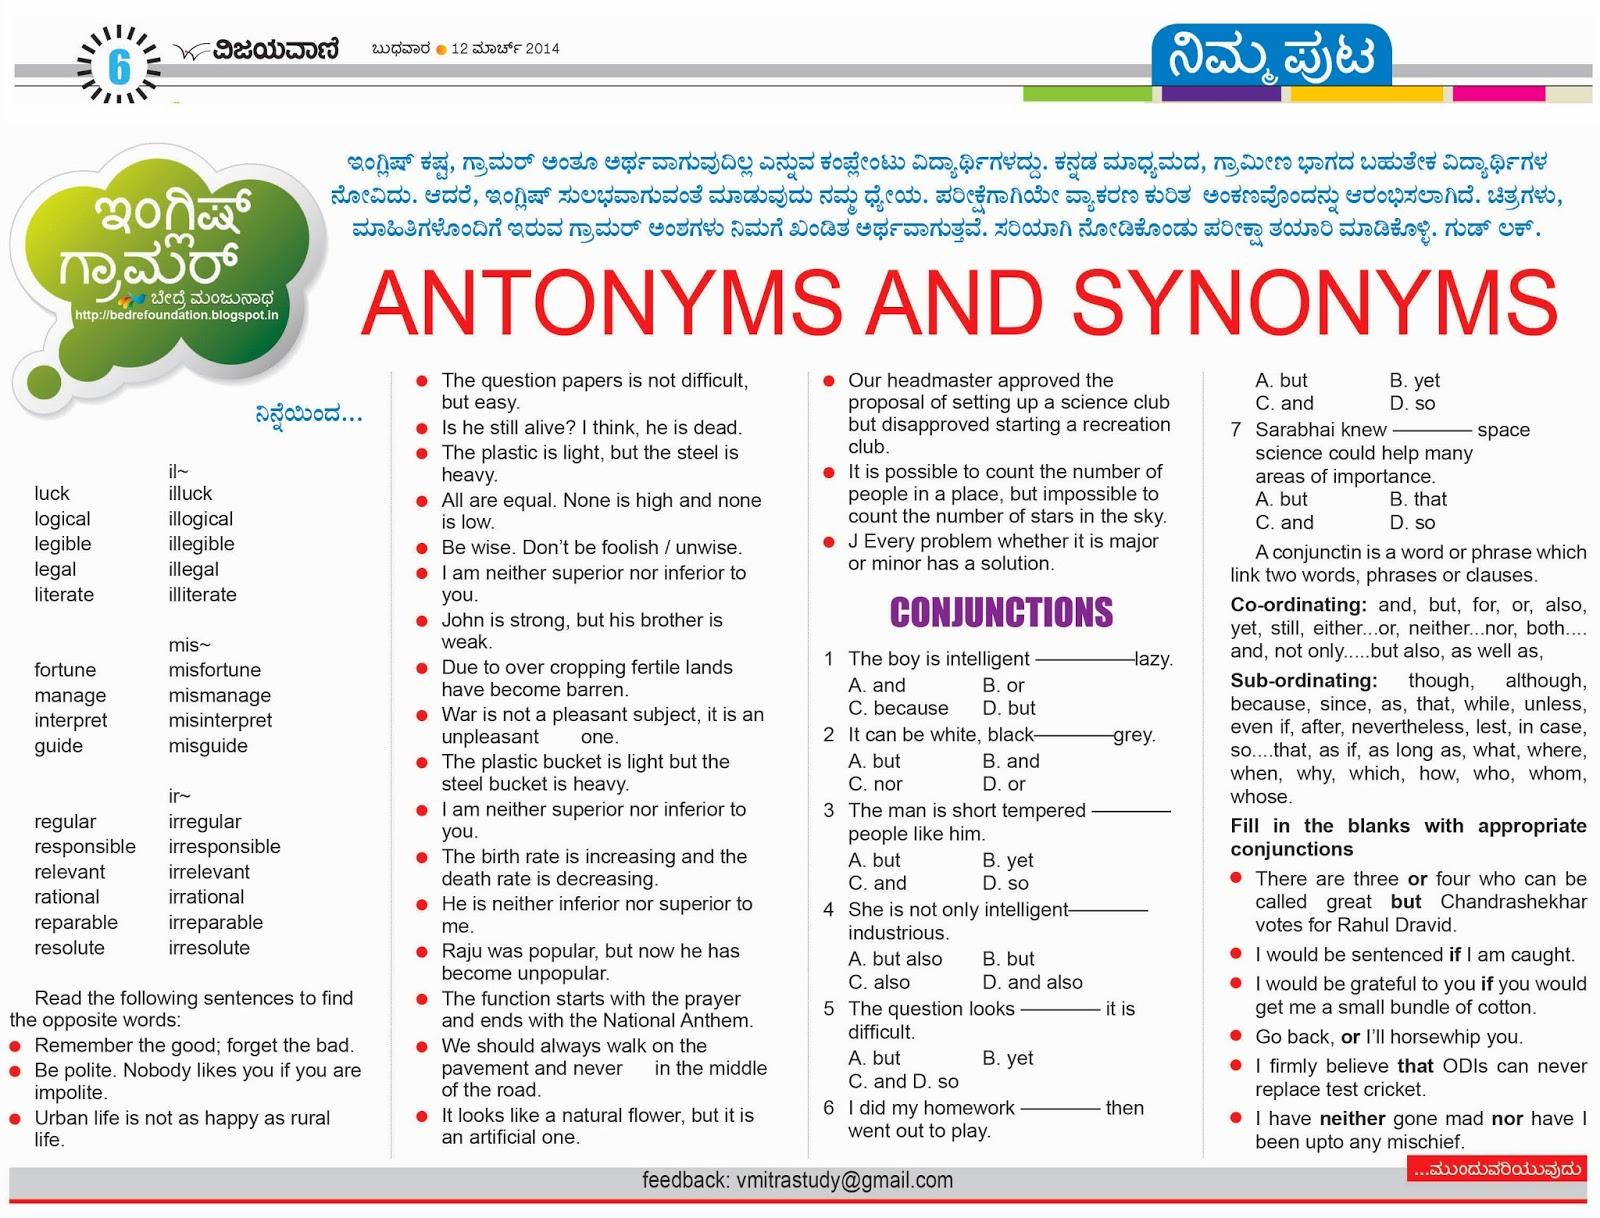 synonyms antonyms